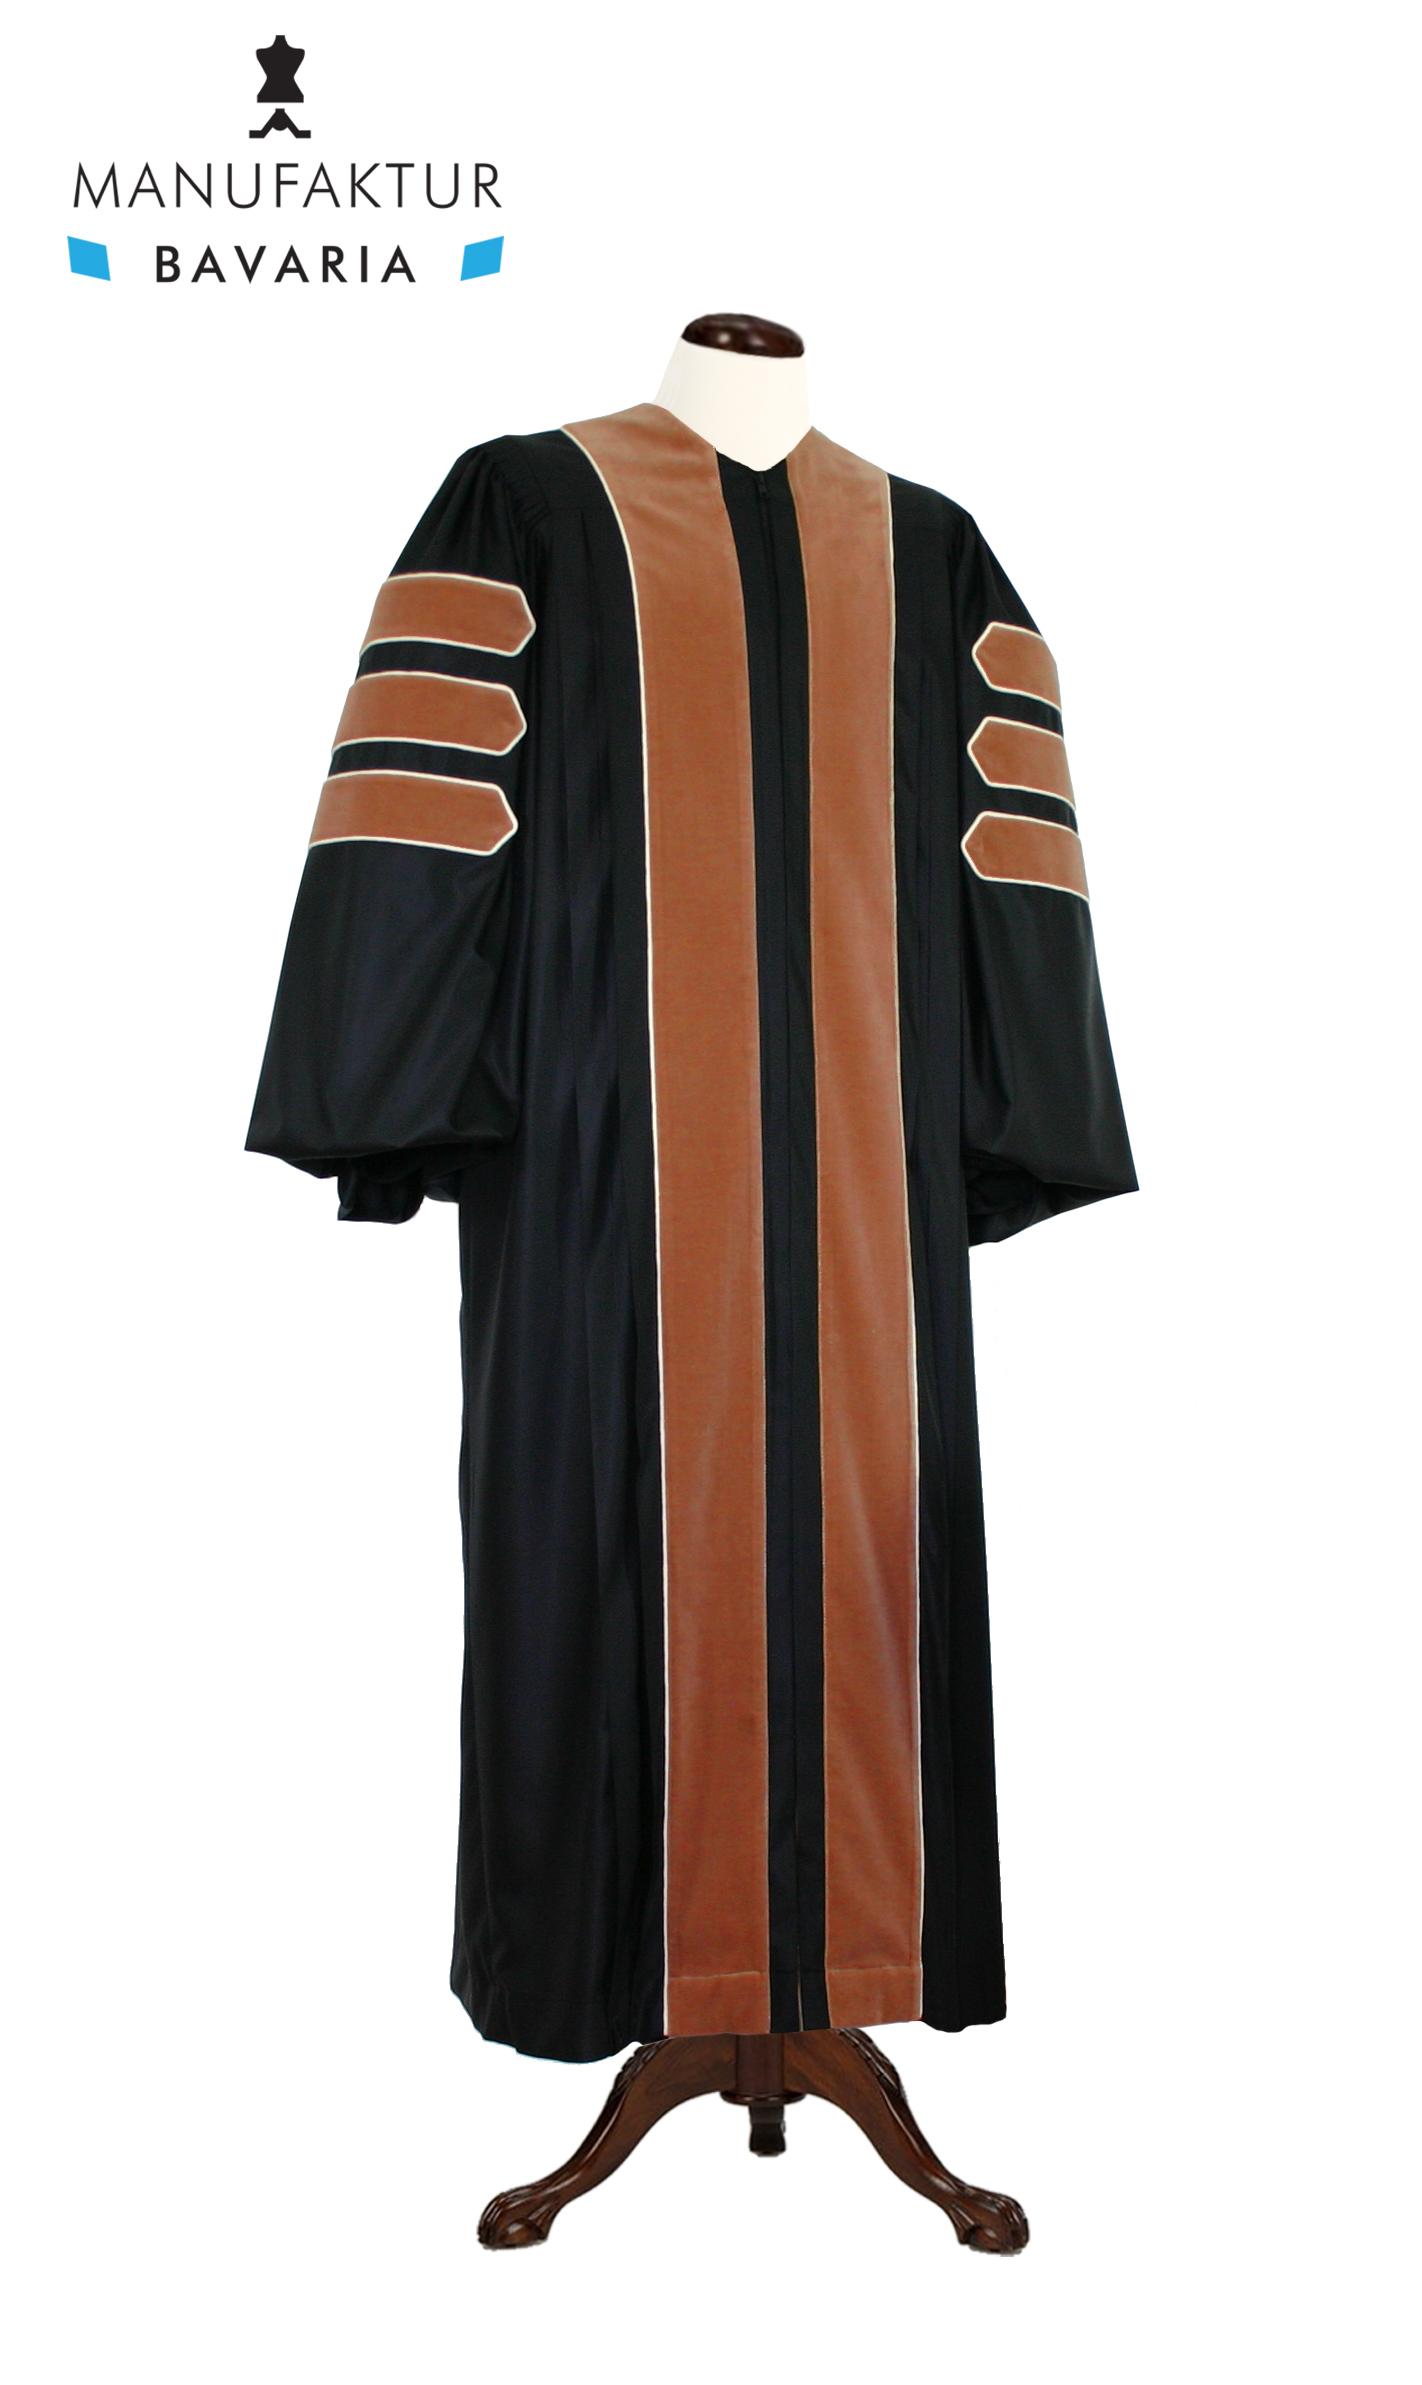 Doktortalar Wirtschaft - royal regalia